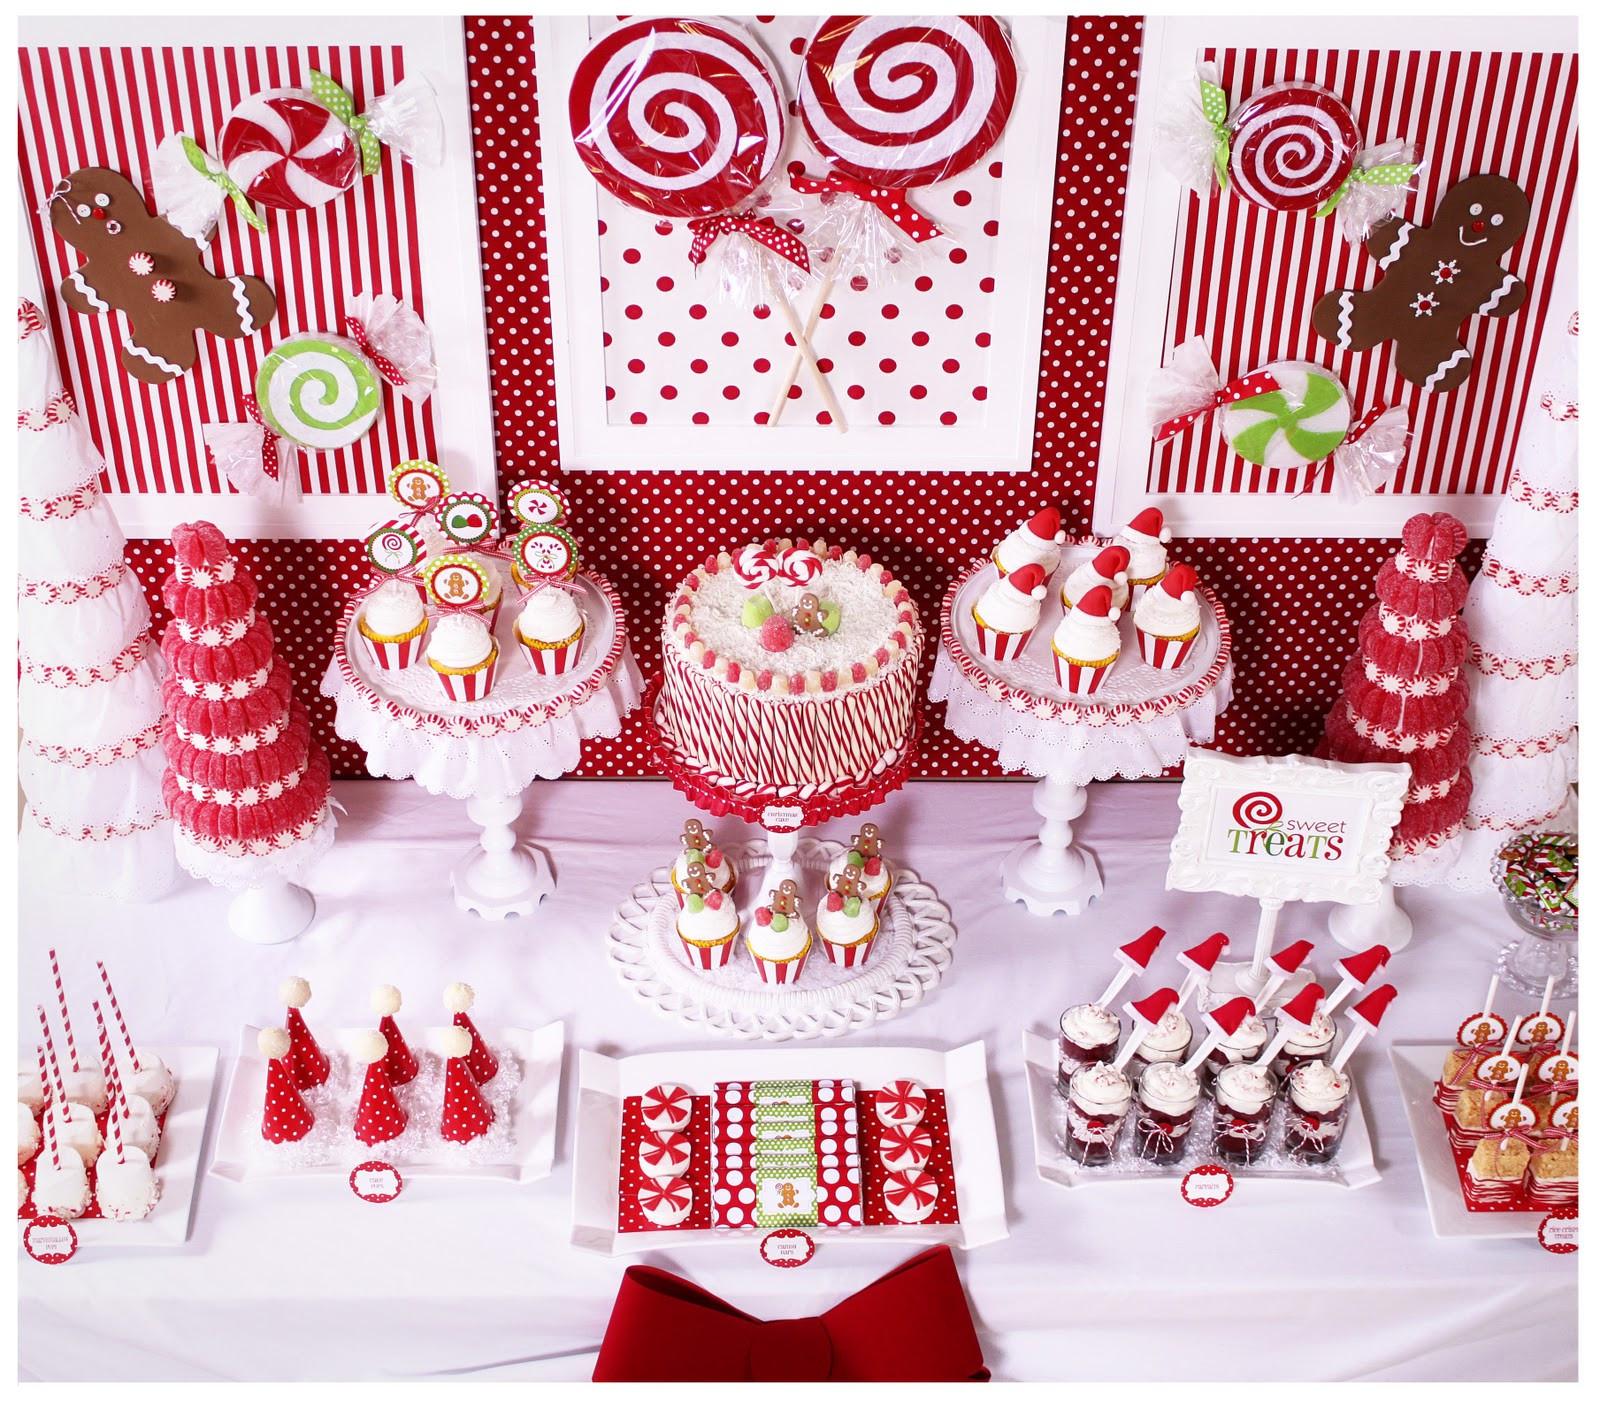 Pinterest Christmas Party Ideas  Kara s Party Ideas Candy Land Christmas Party